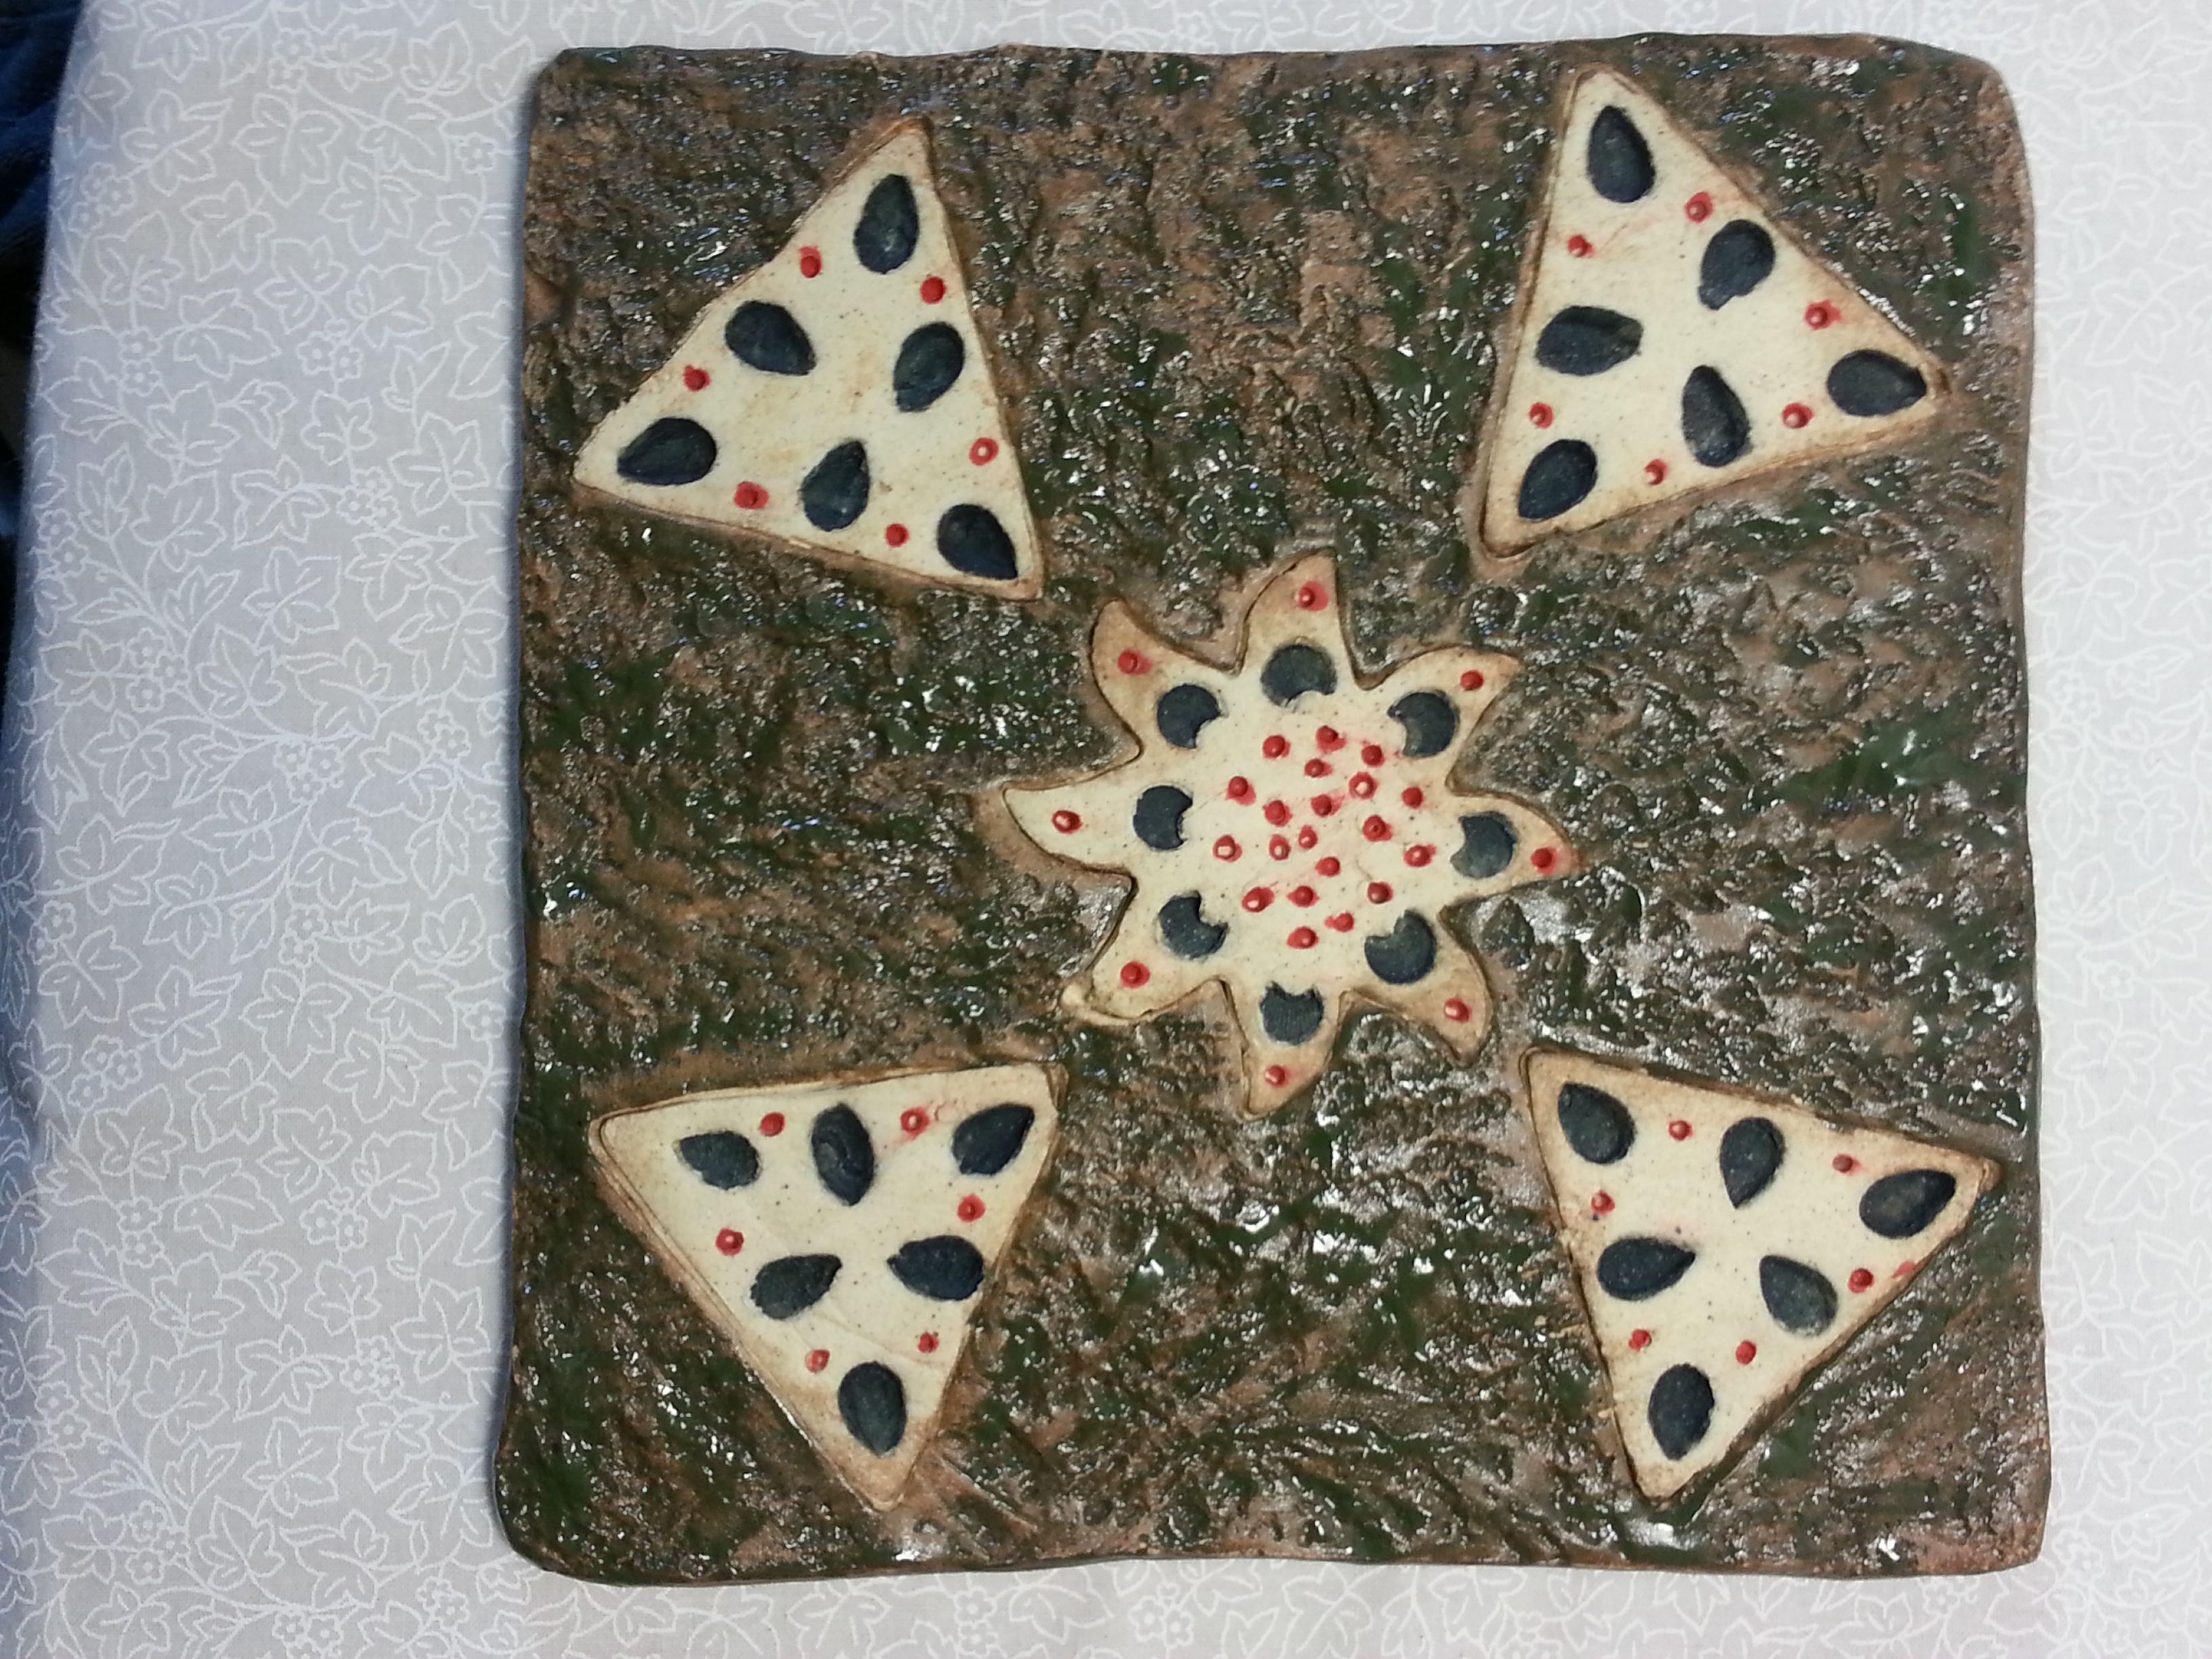 Samuel Turner - Ceramic Tile